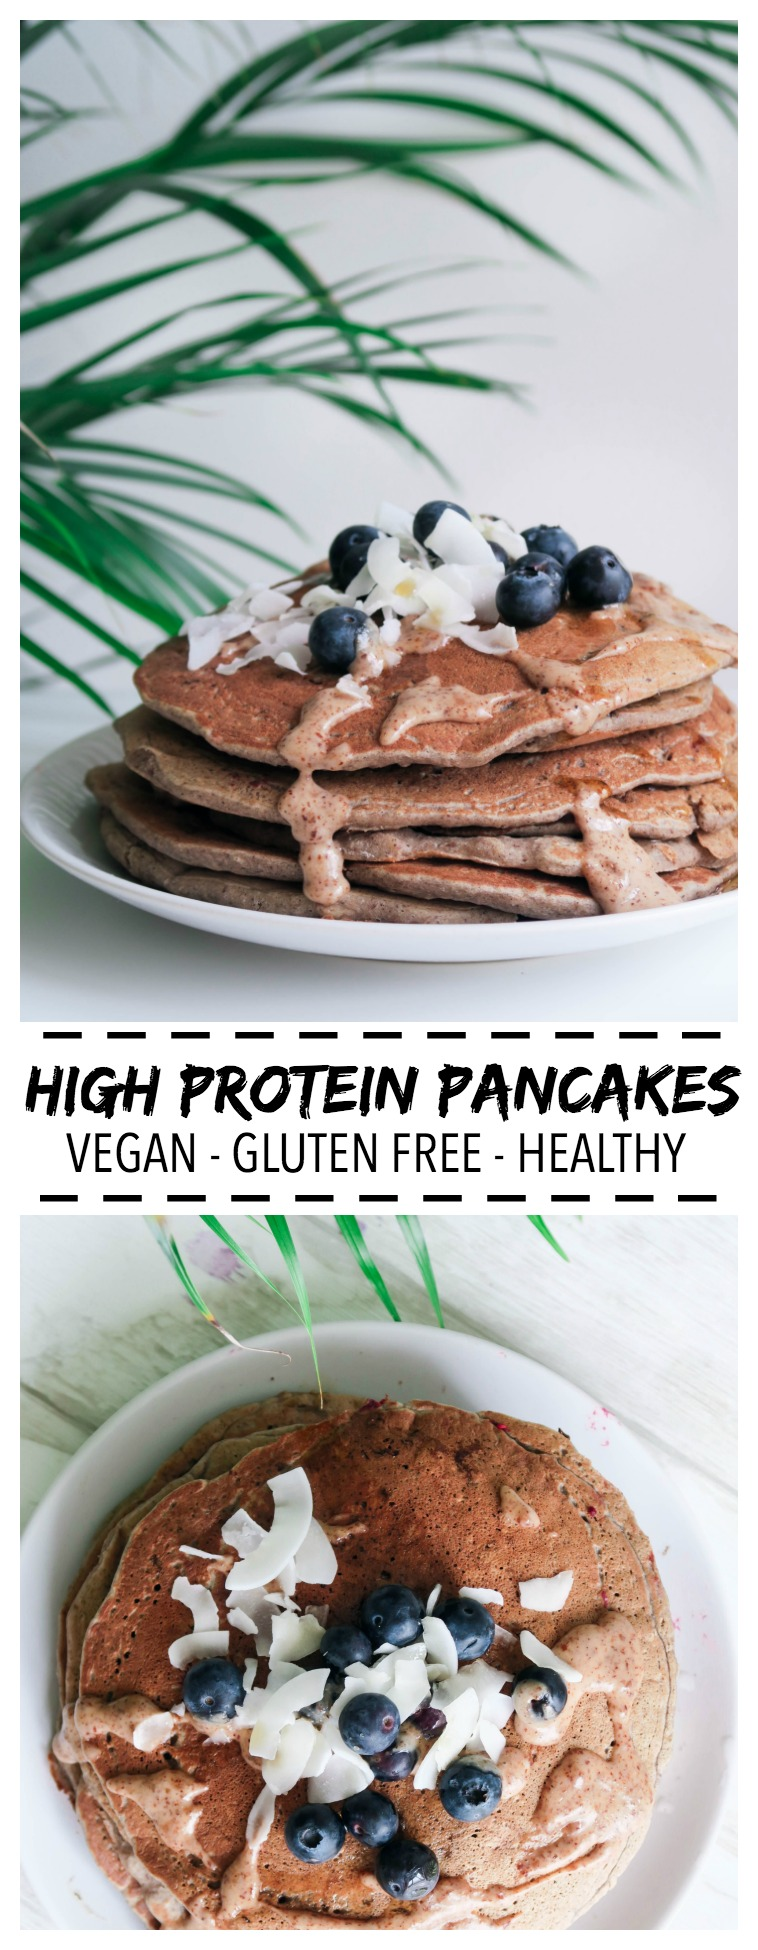 Vegan High Protein Pancakes - amelietahiti.com